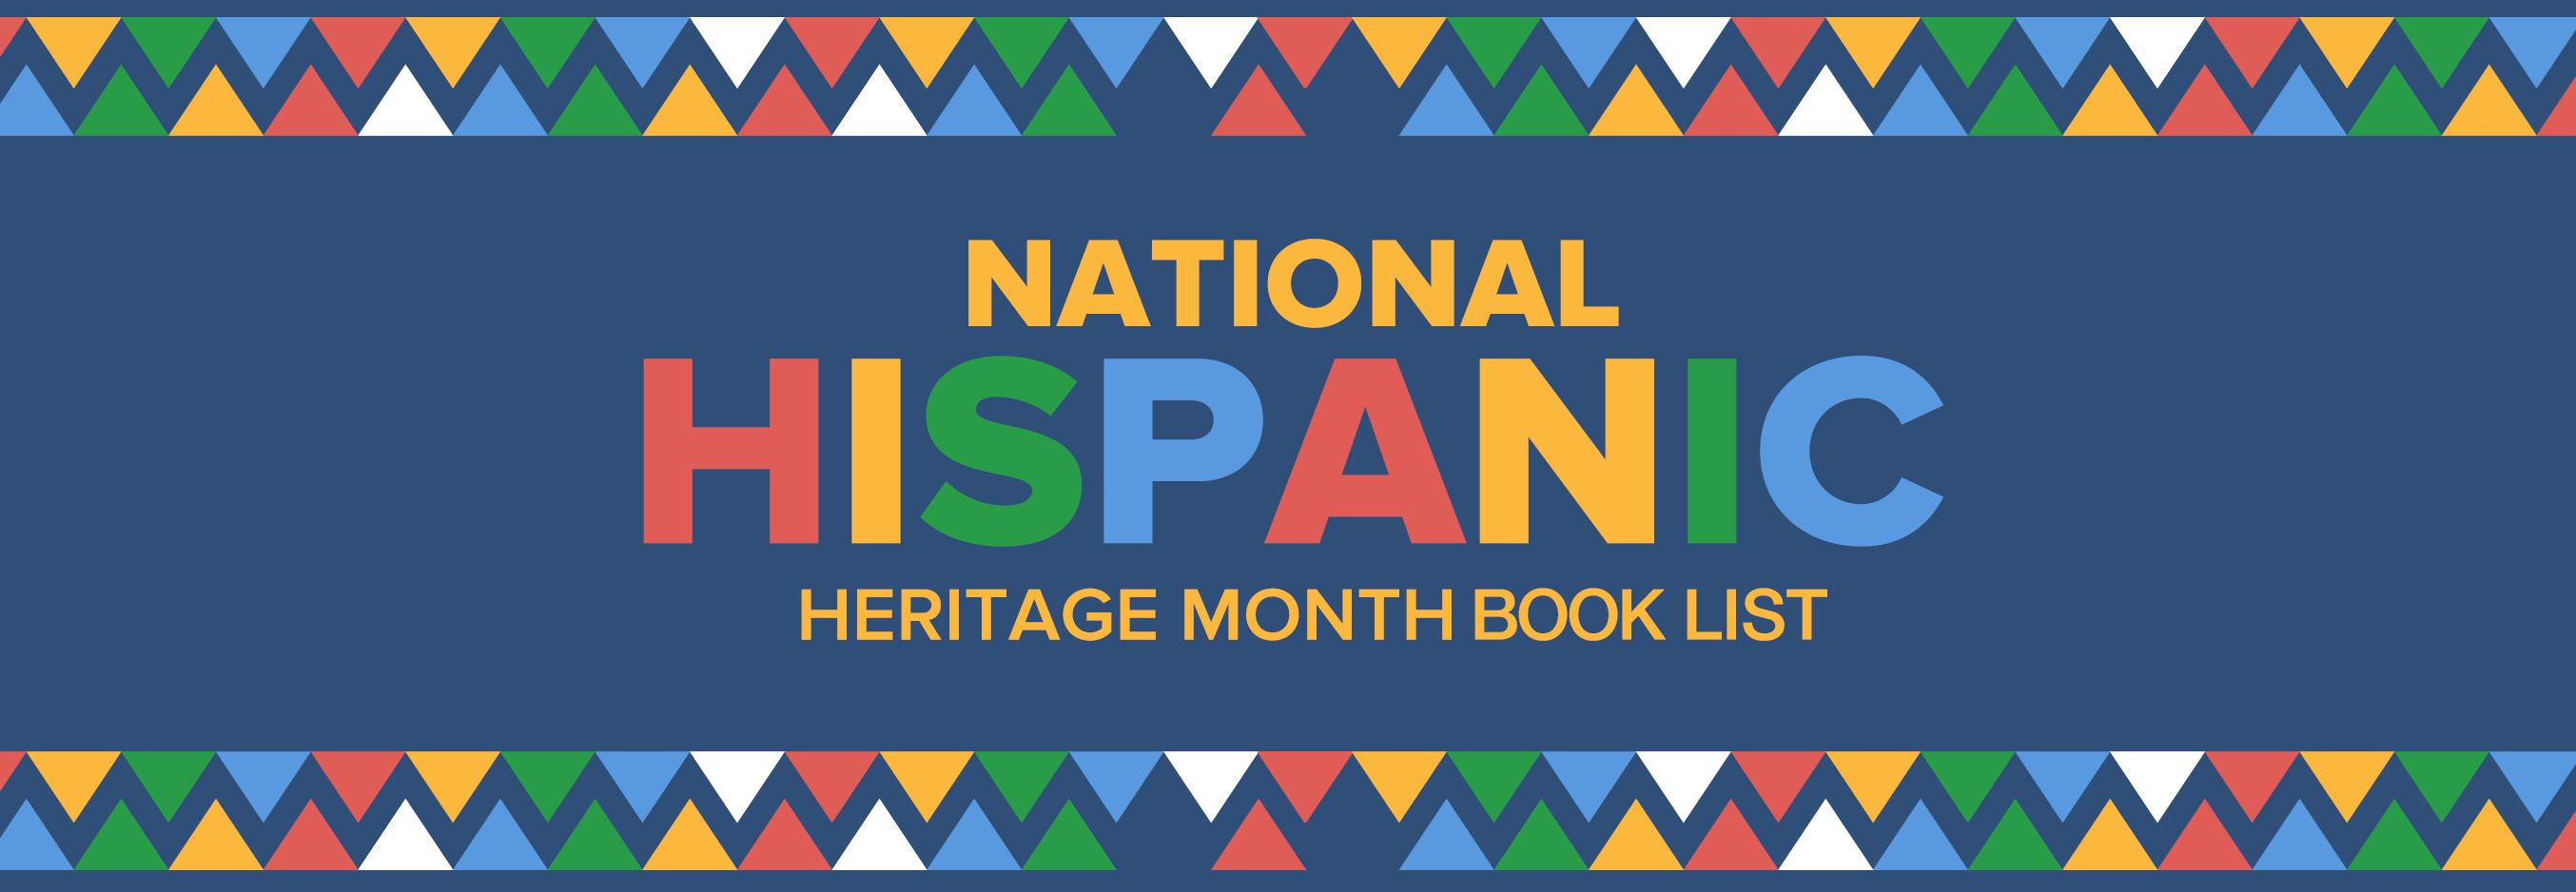 Hispanic Heritage Month Book List